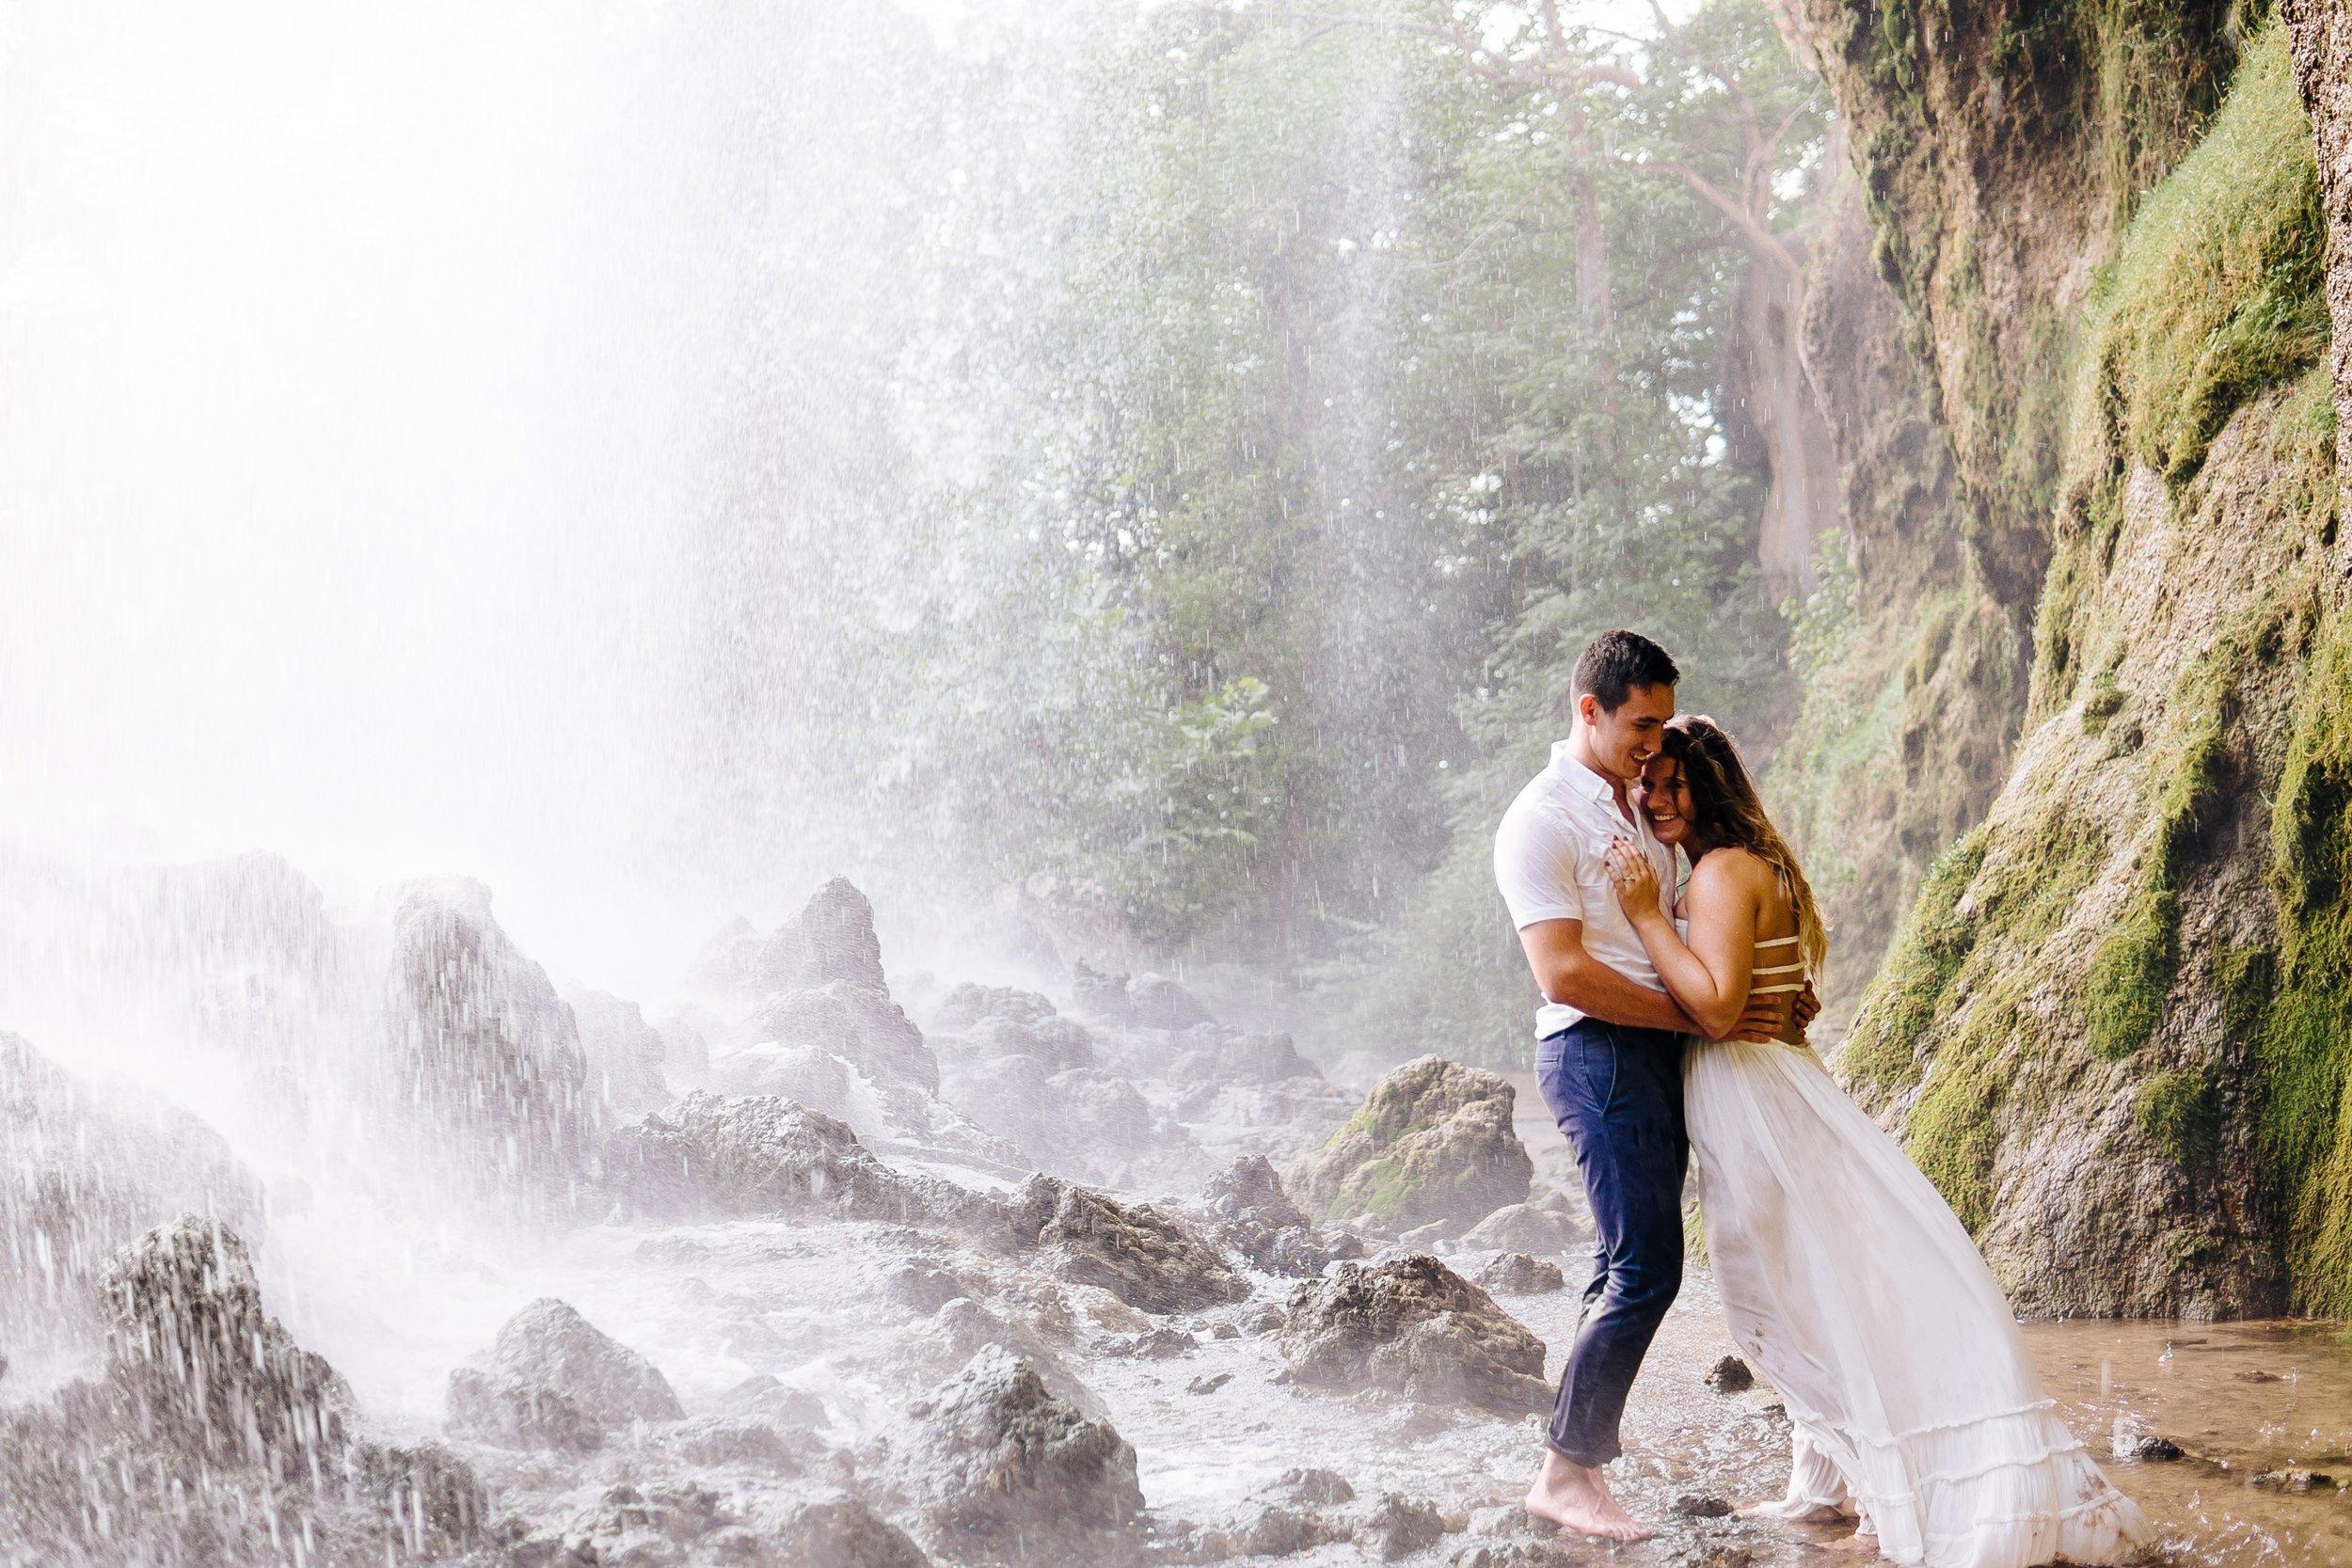 waterfall-engagement-session-shenandoah-Alleghany-Highlands-covington-va-jonathan-hannah-photography